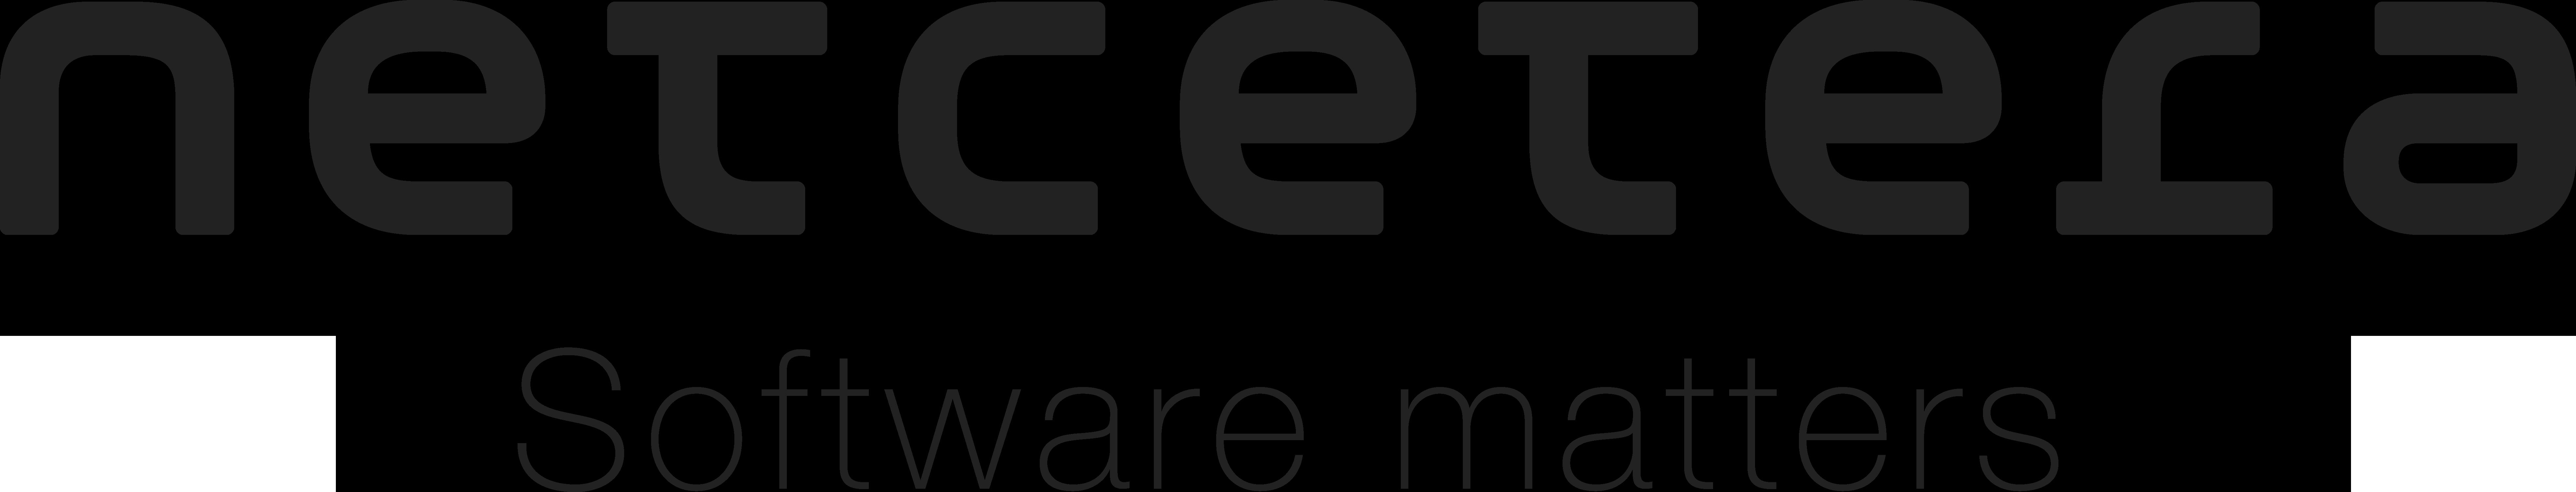 nectcetera logo